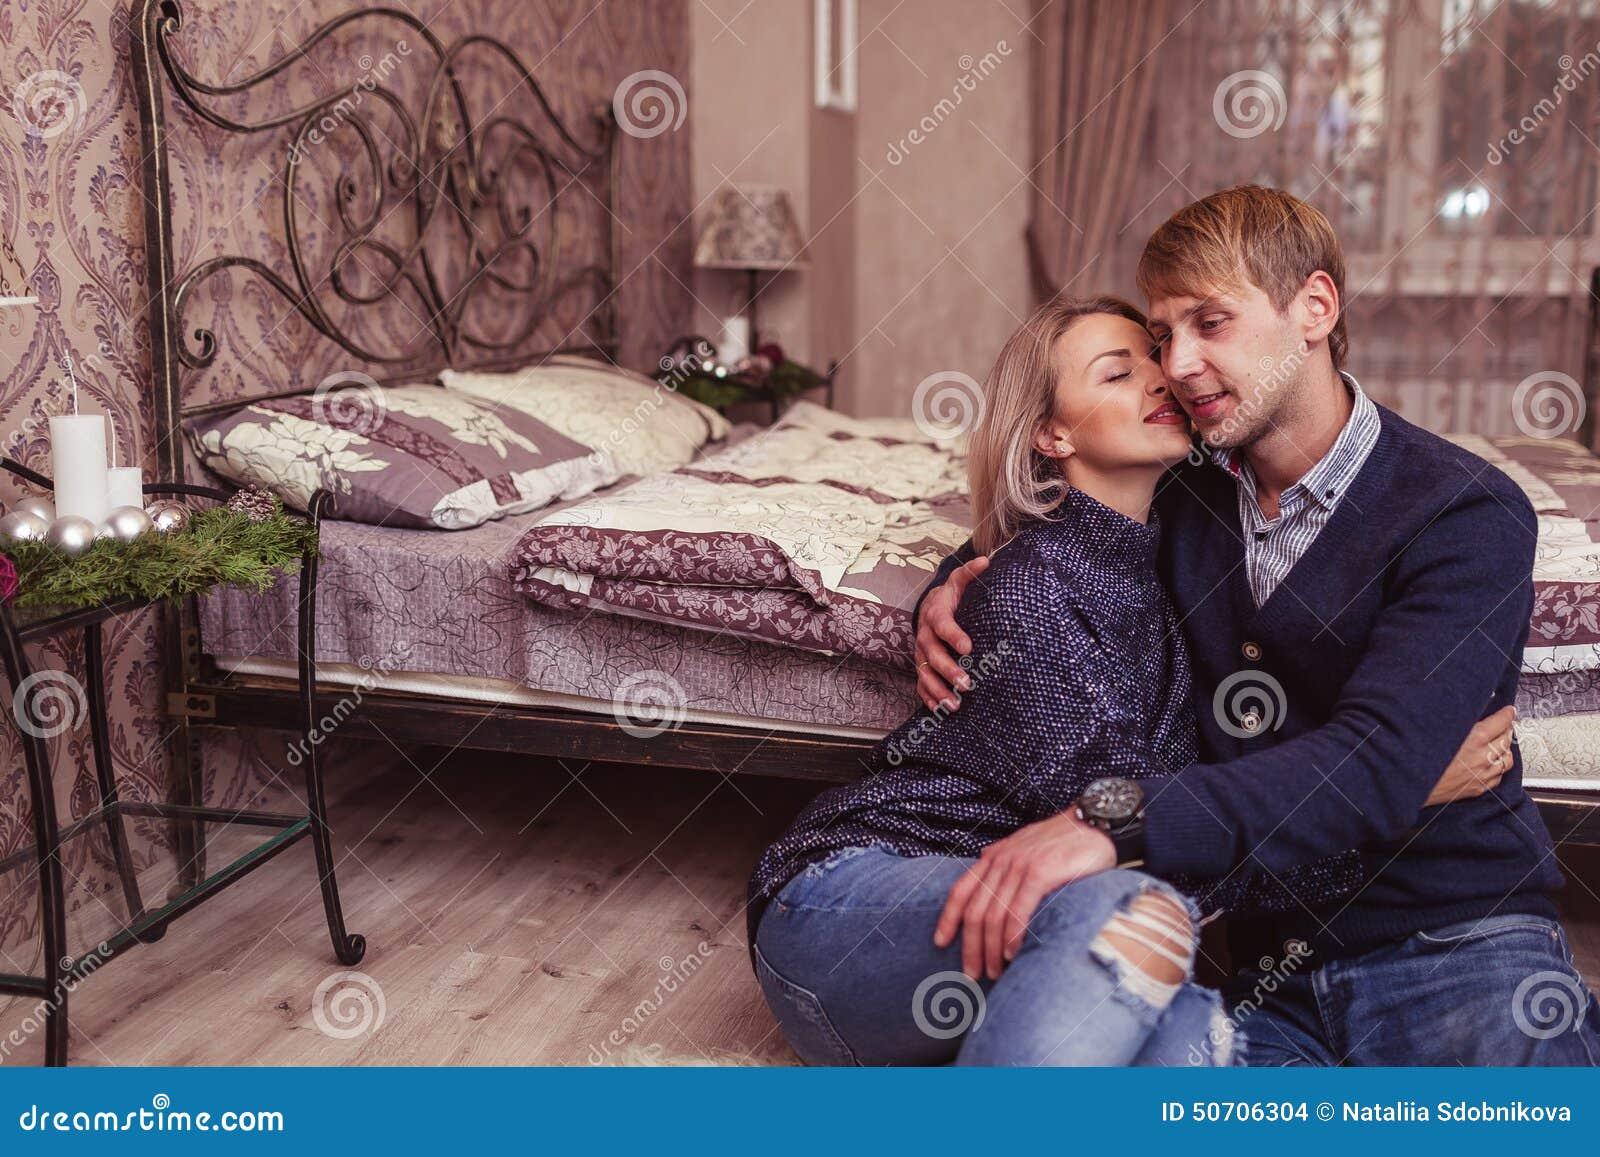 Couple in love in bedroom stock photo image 50706304 for Love bedroom photo